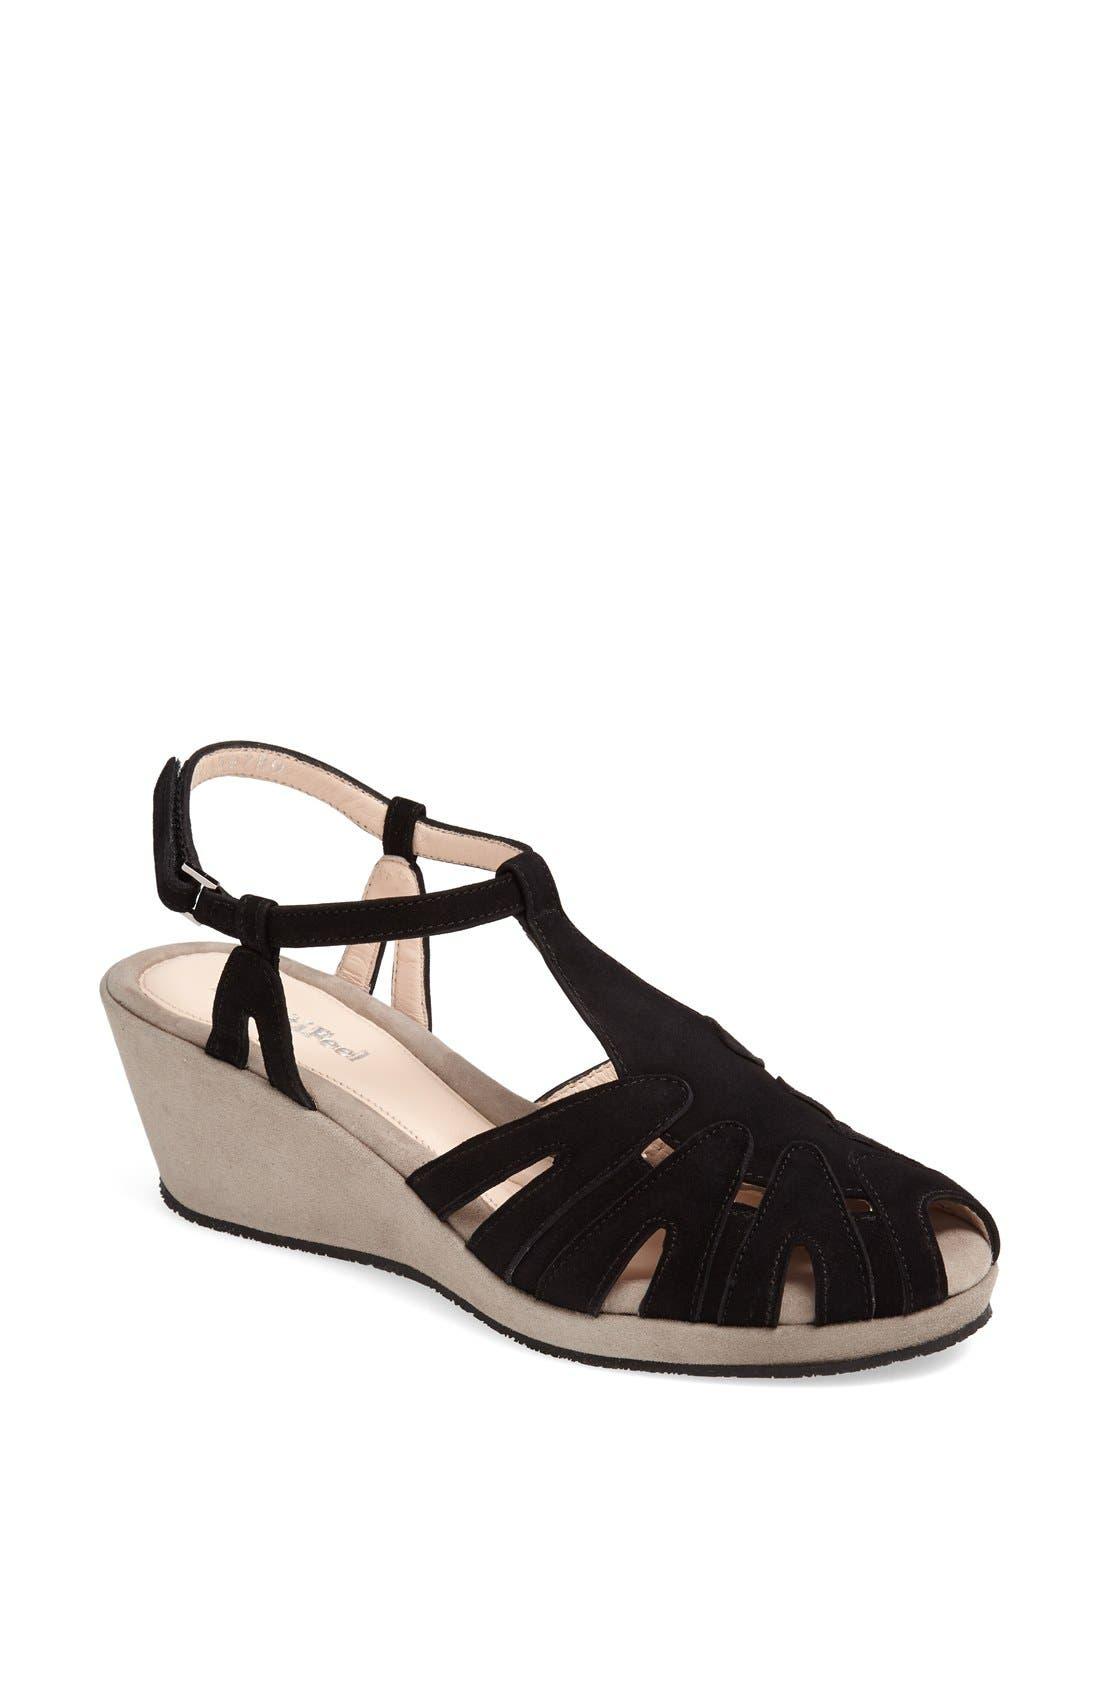 Alternate Image 1 Selected - BeautiFeel 'Candy' Sandal